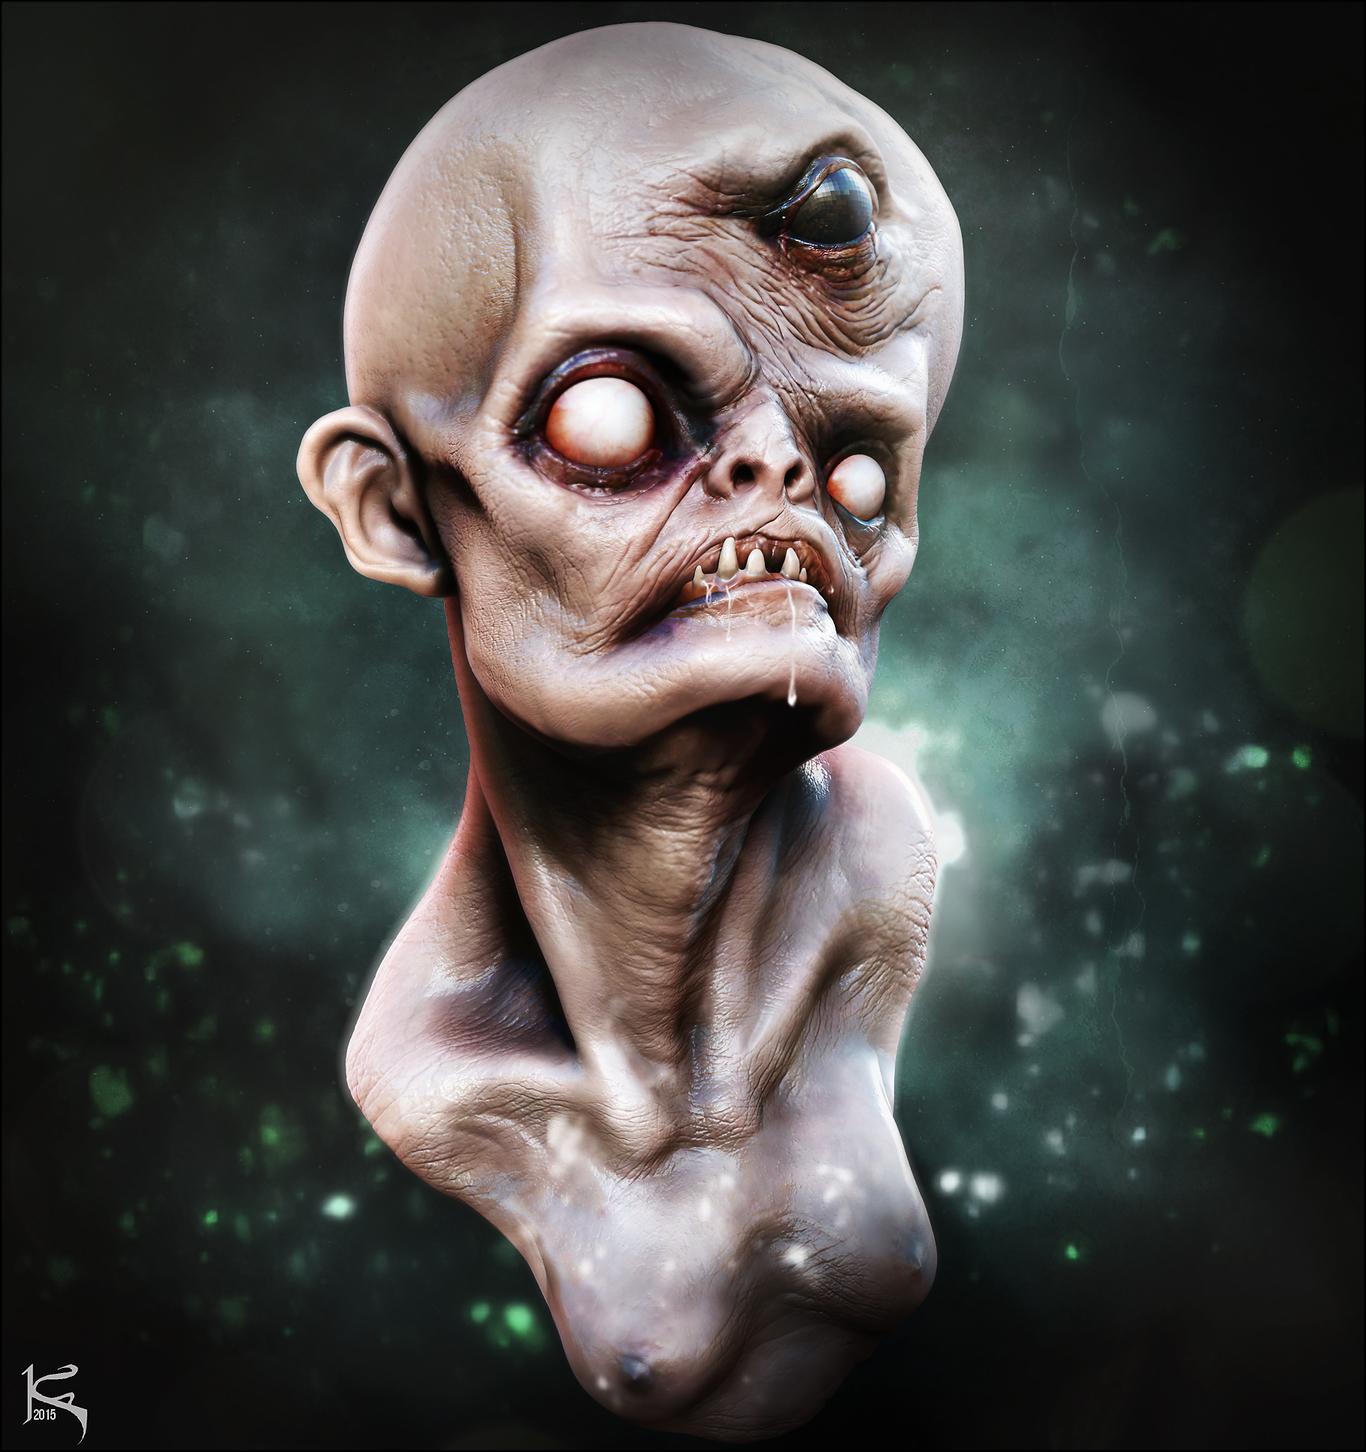 Josh Hardie Fan Art #3 - Monster Creature Design Doodle